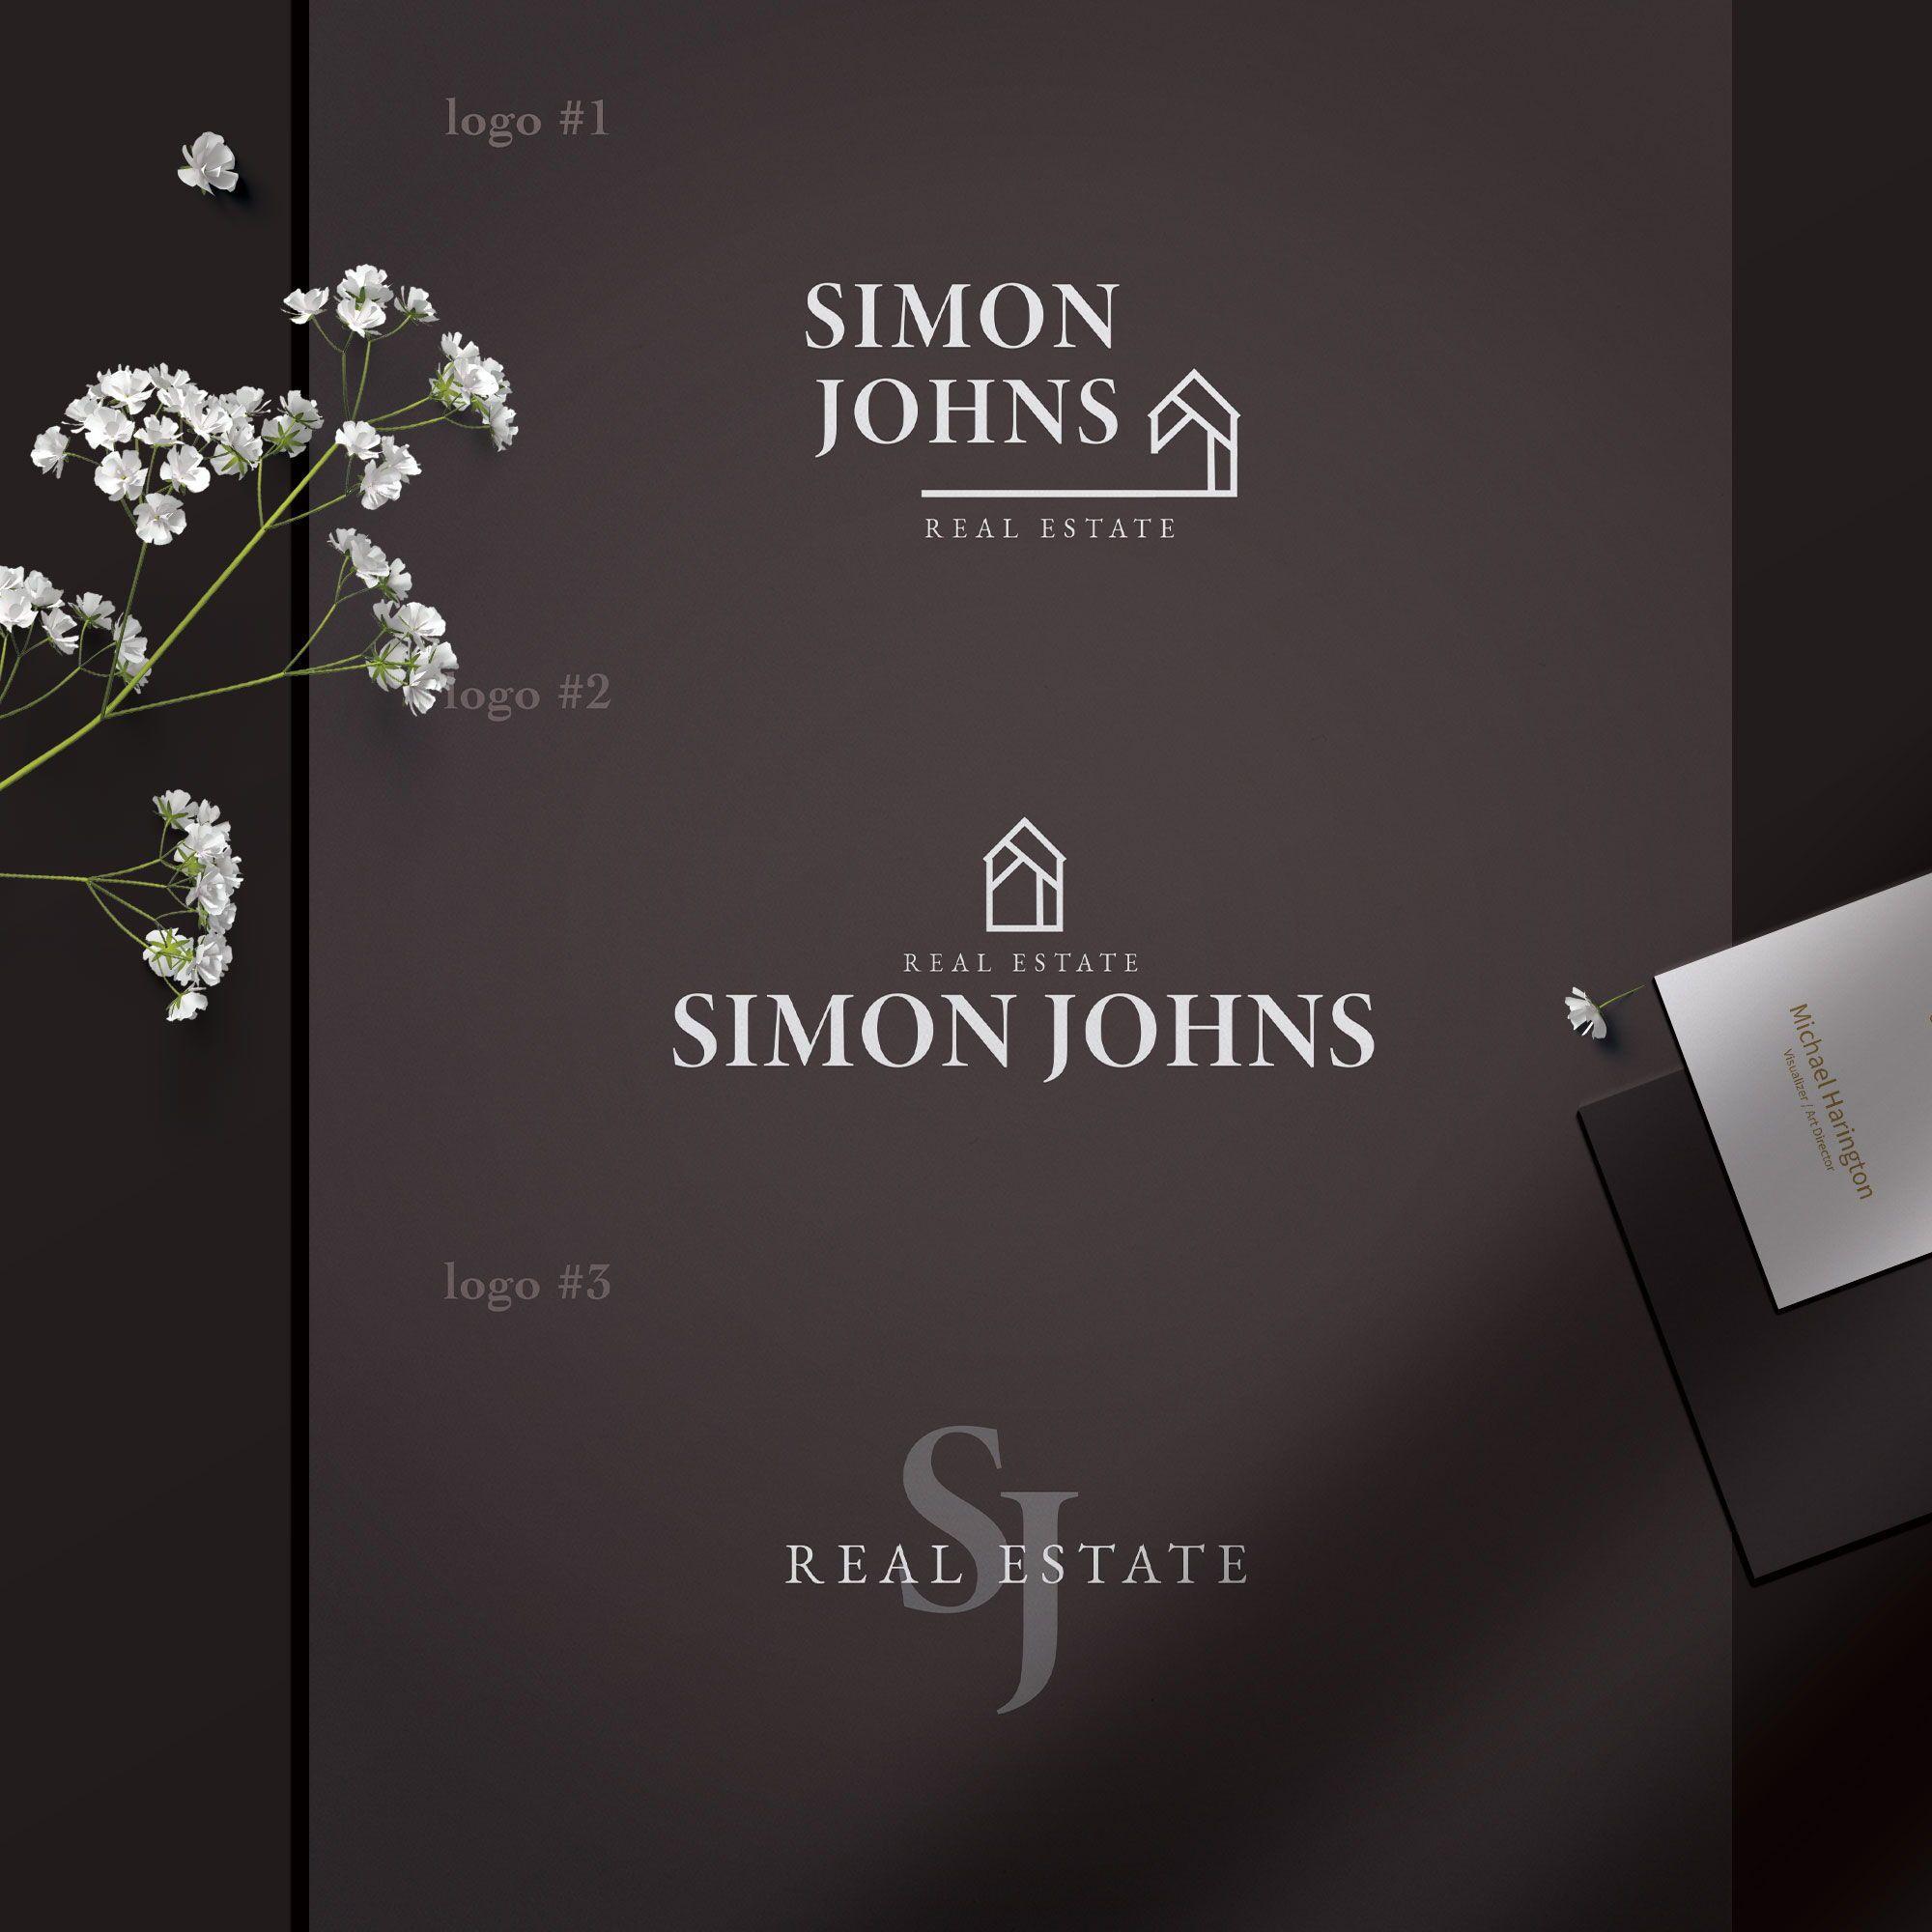 Signature Real estate logo design handwritten realtor